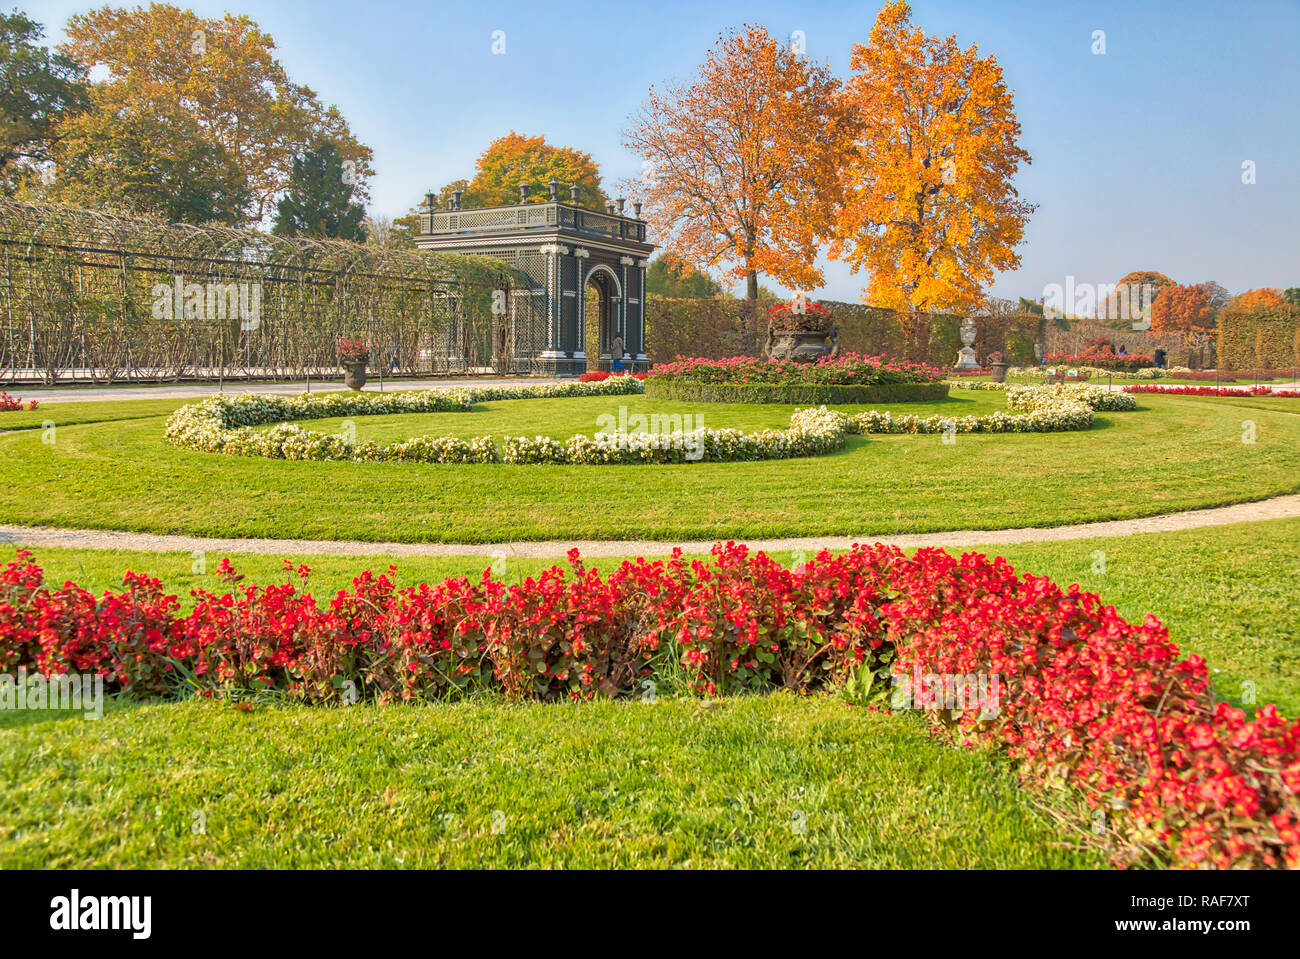 Schonbrunn Palace in Vienna, Austria - Stock Image